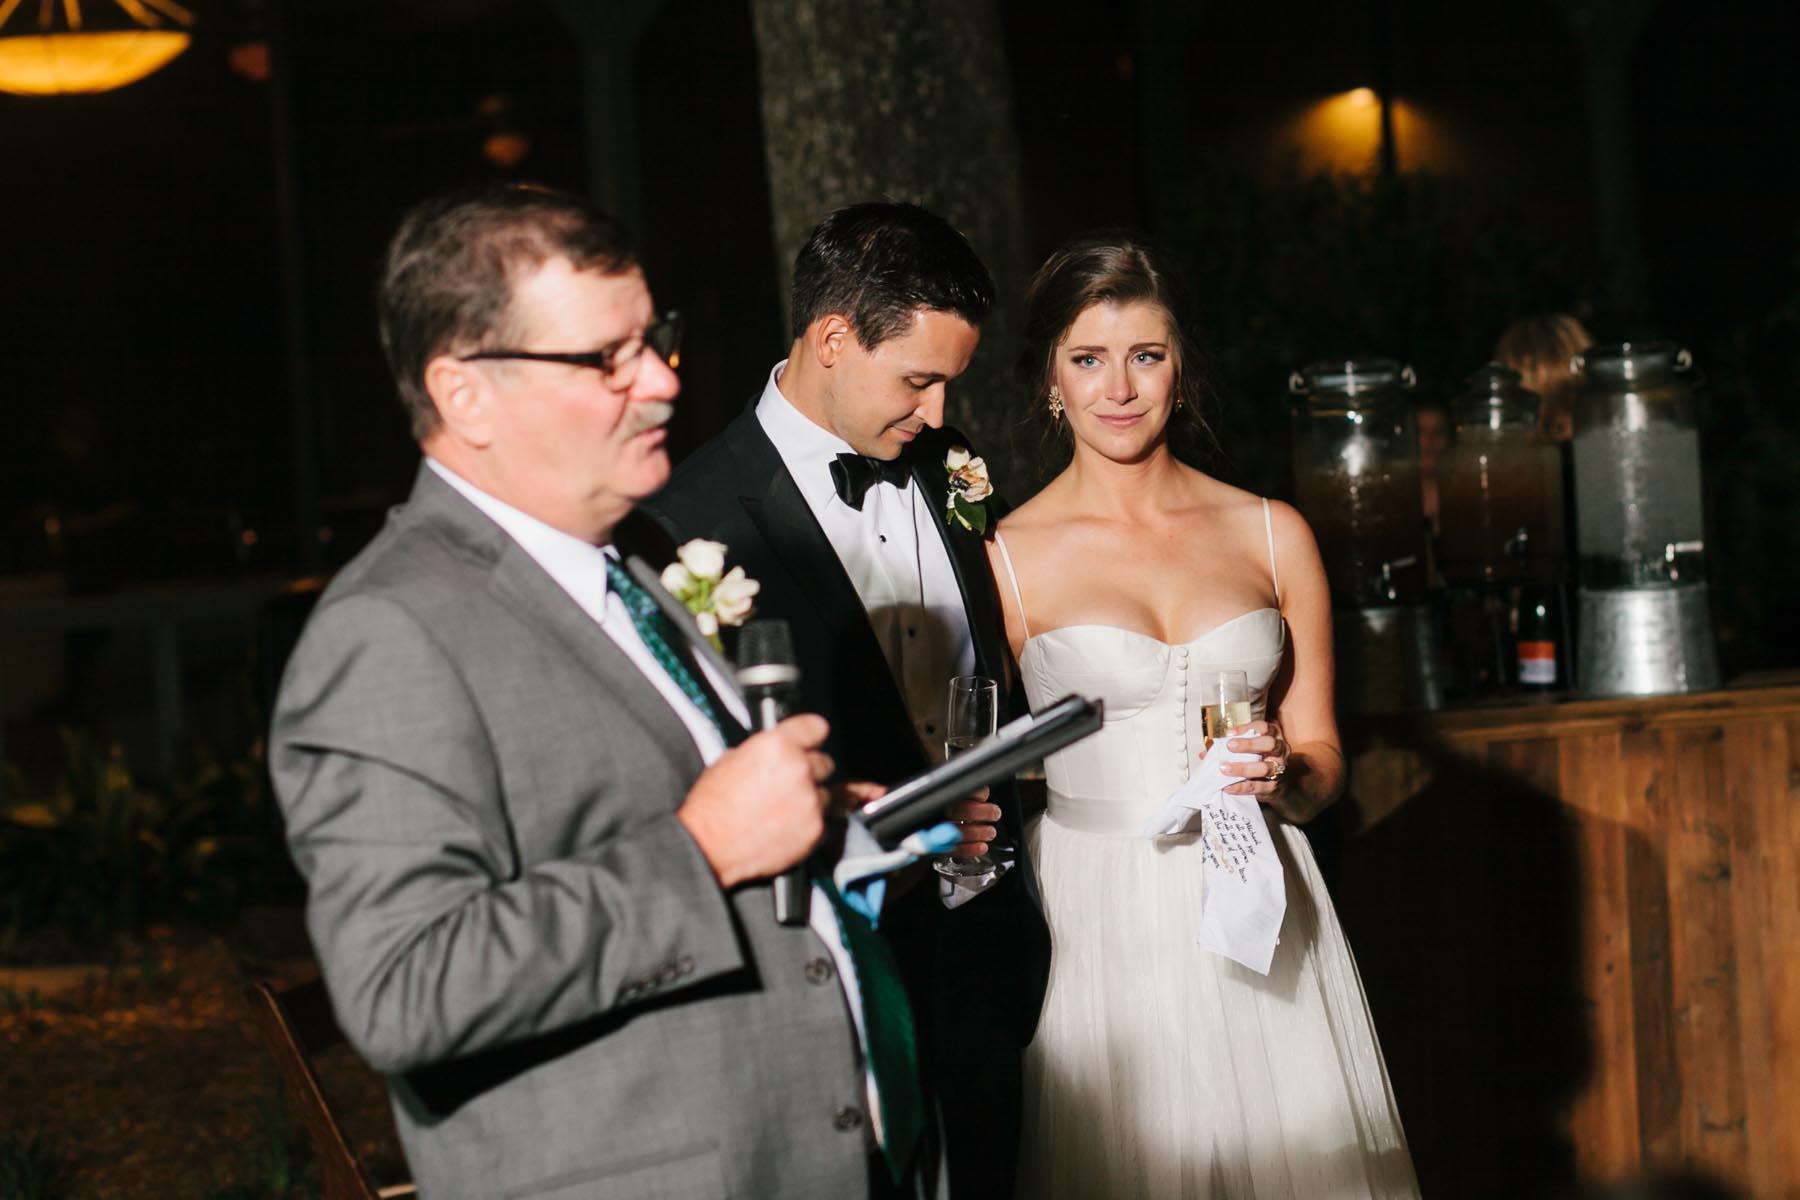 lowry wedding blog eden garden florida wedding-134